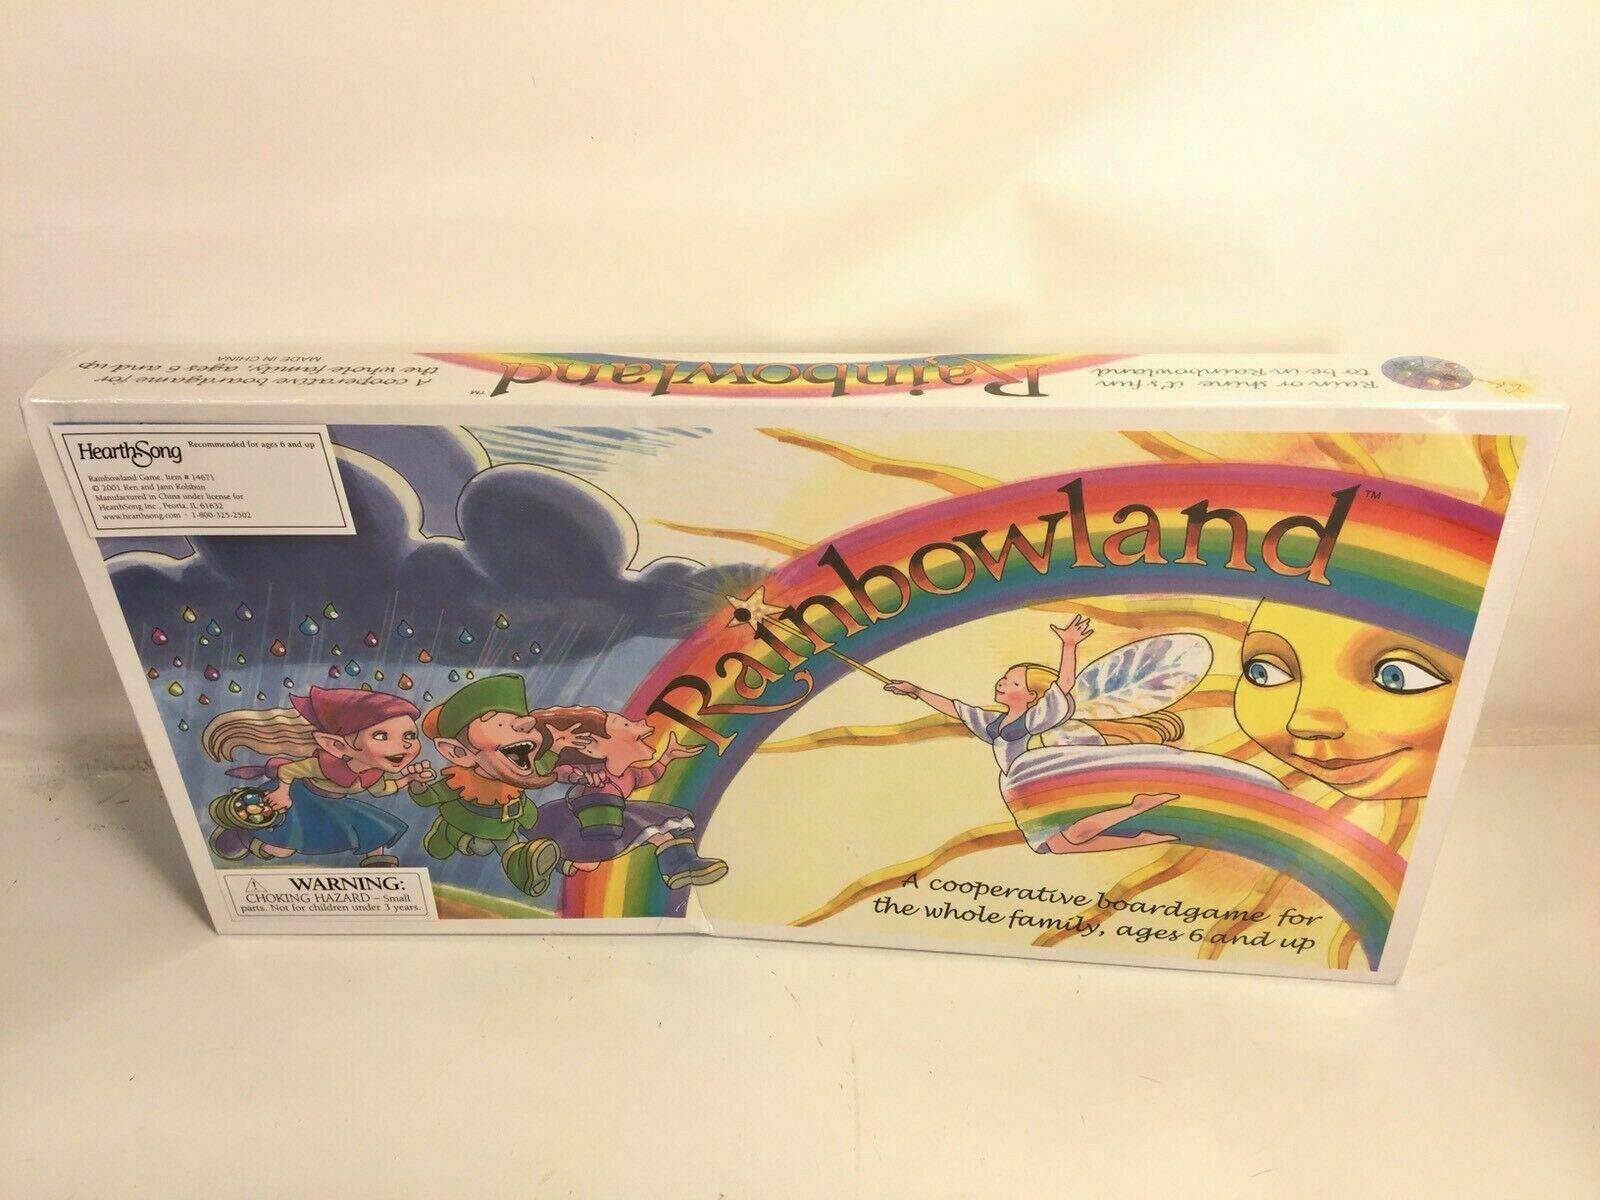 Rainbowland Cooperative Boardgame Kolsbun Family Game New In Box Rare